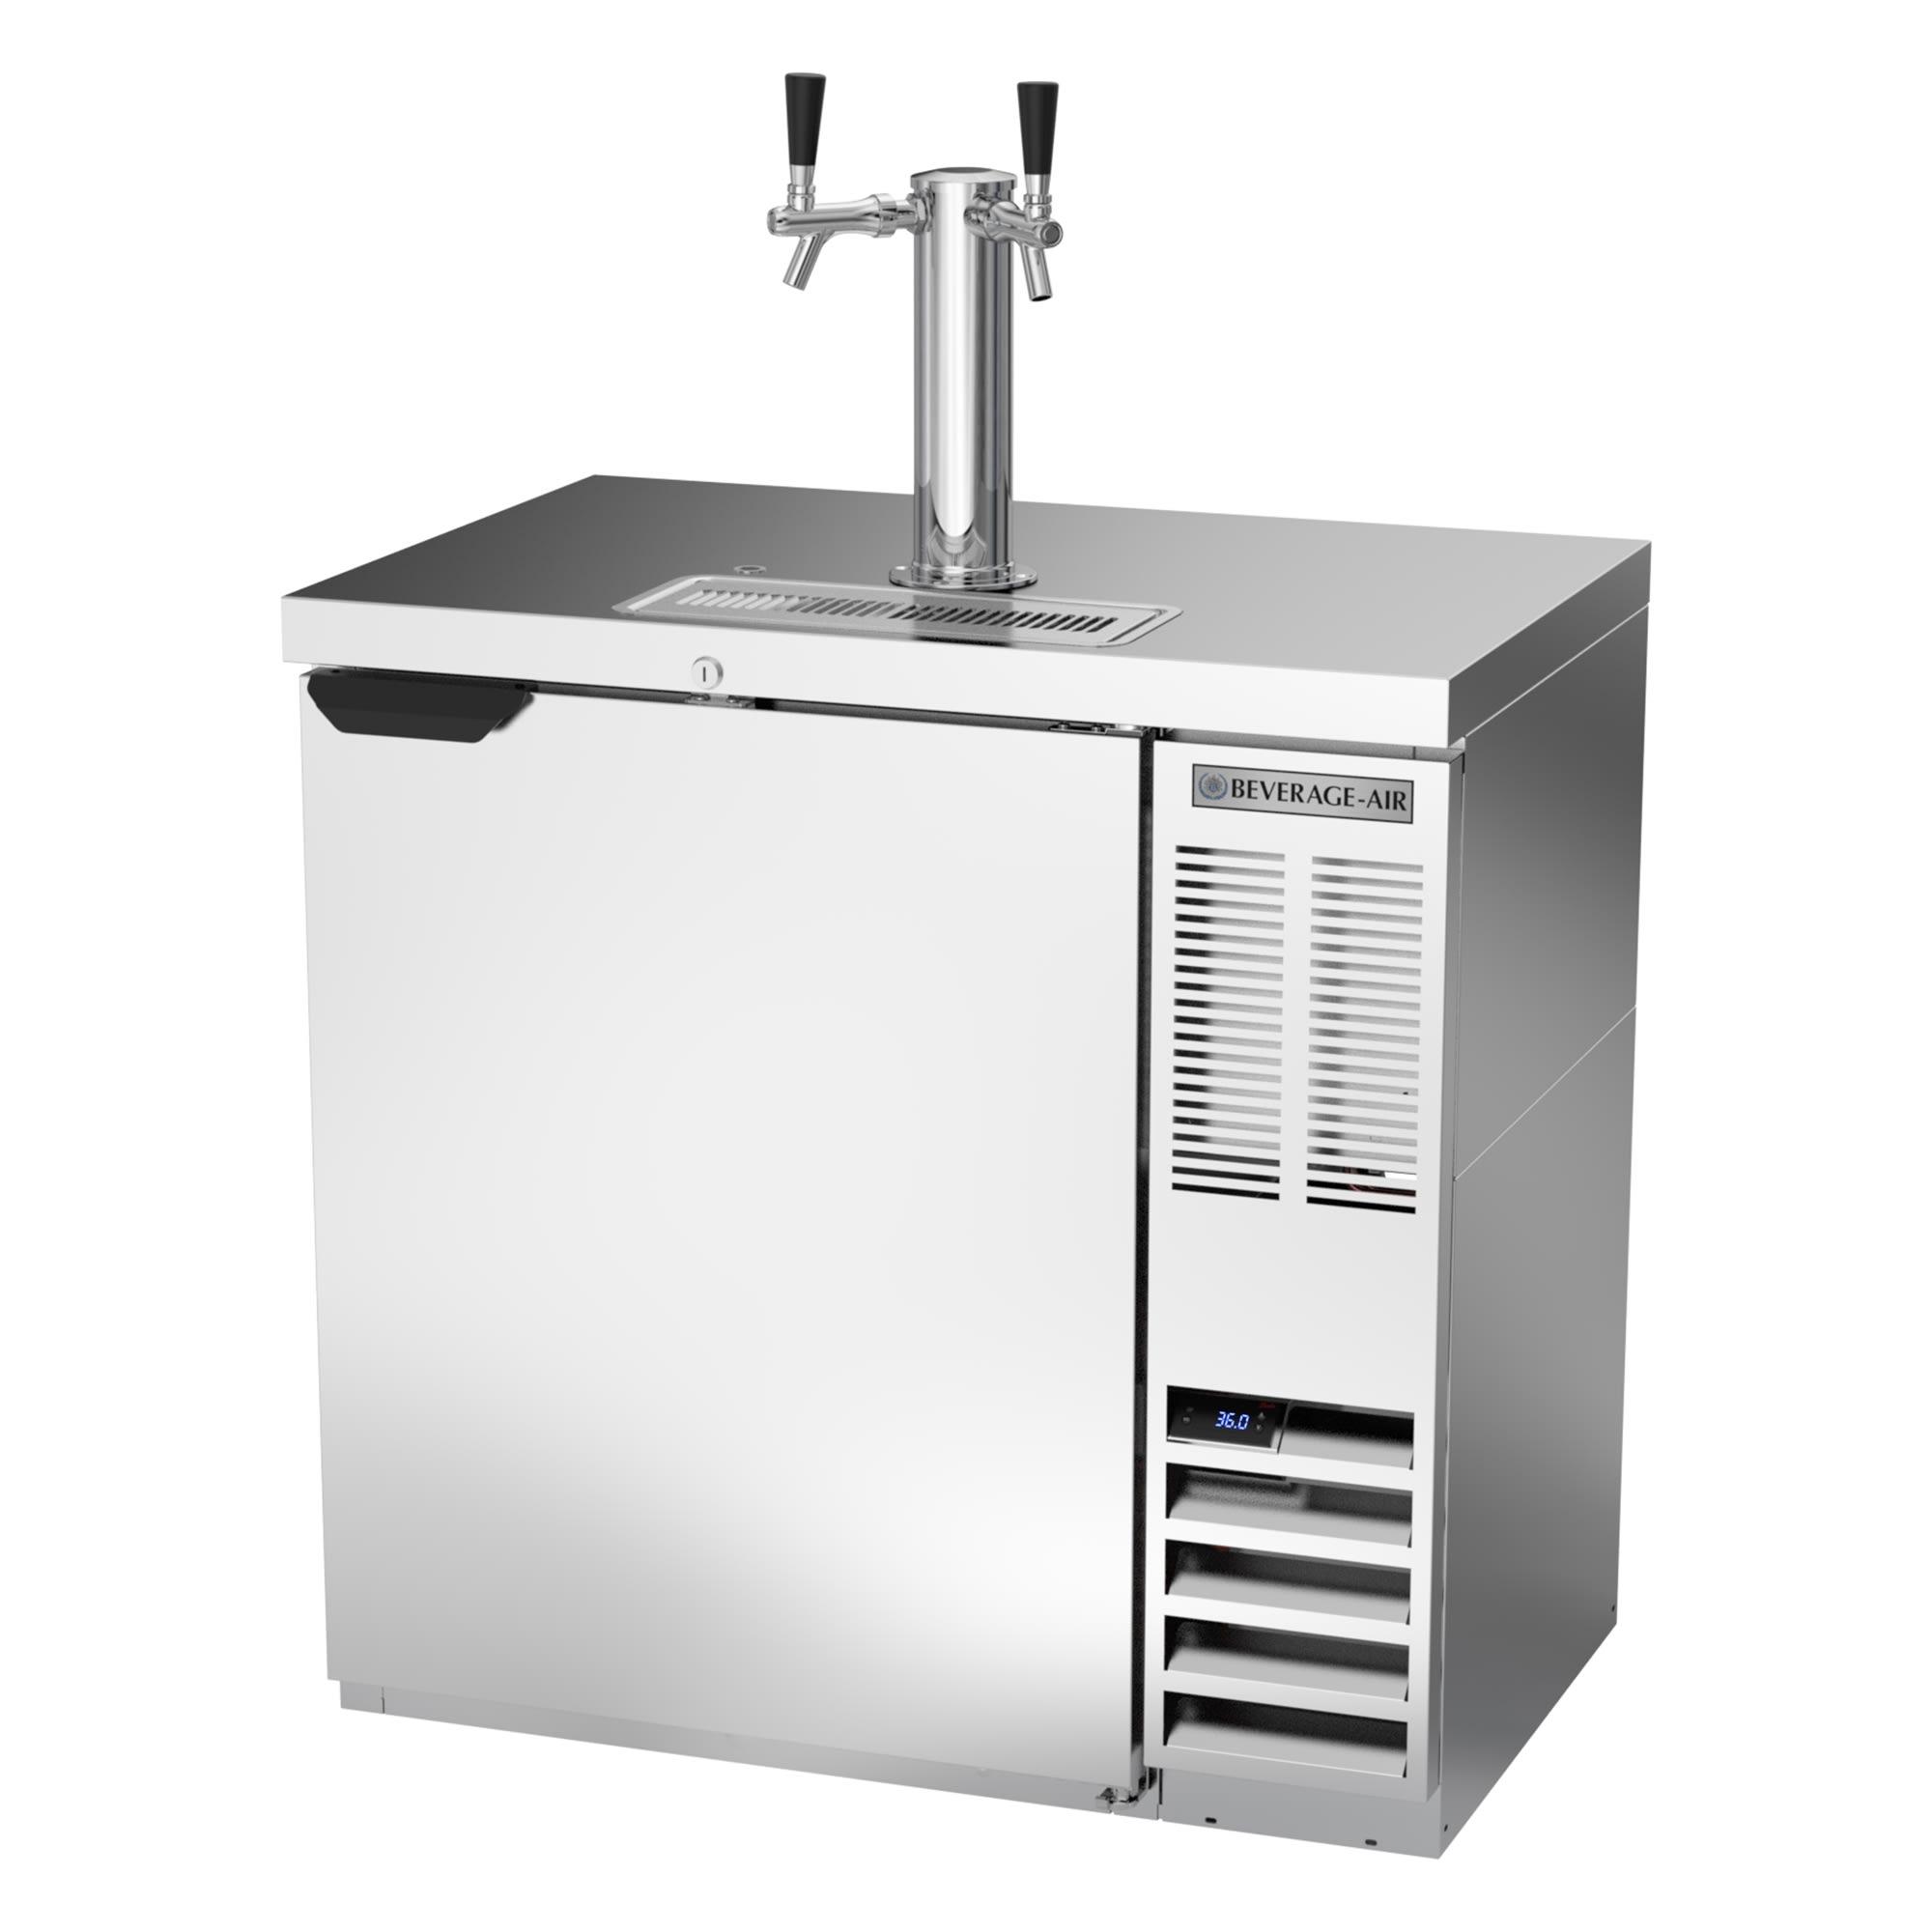 "Beverage Air DD36HC-1-S 36"" Draft Beer System w/ (1) 1/2 Keg Capacity - (1) Column, Stainless, 115v"